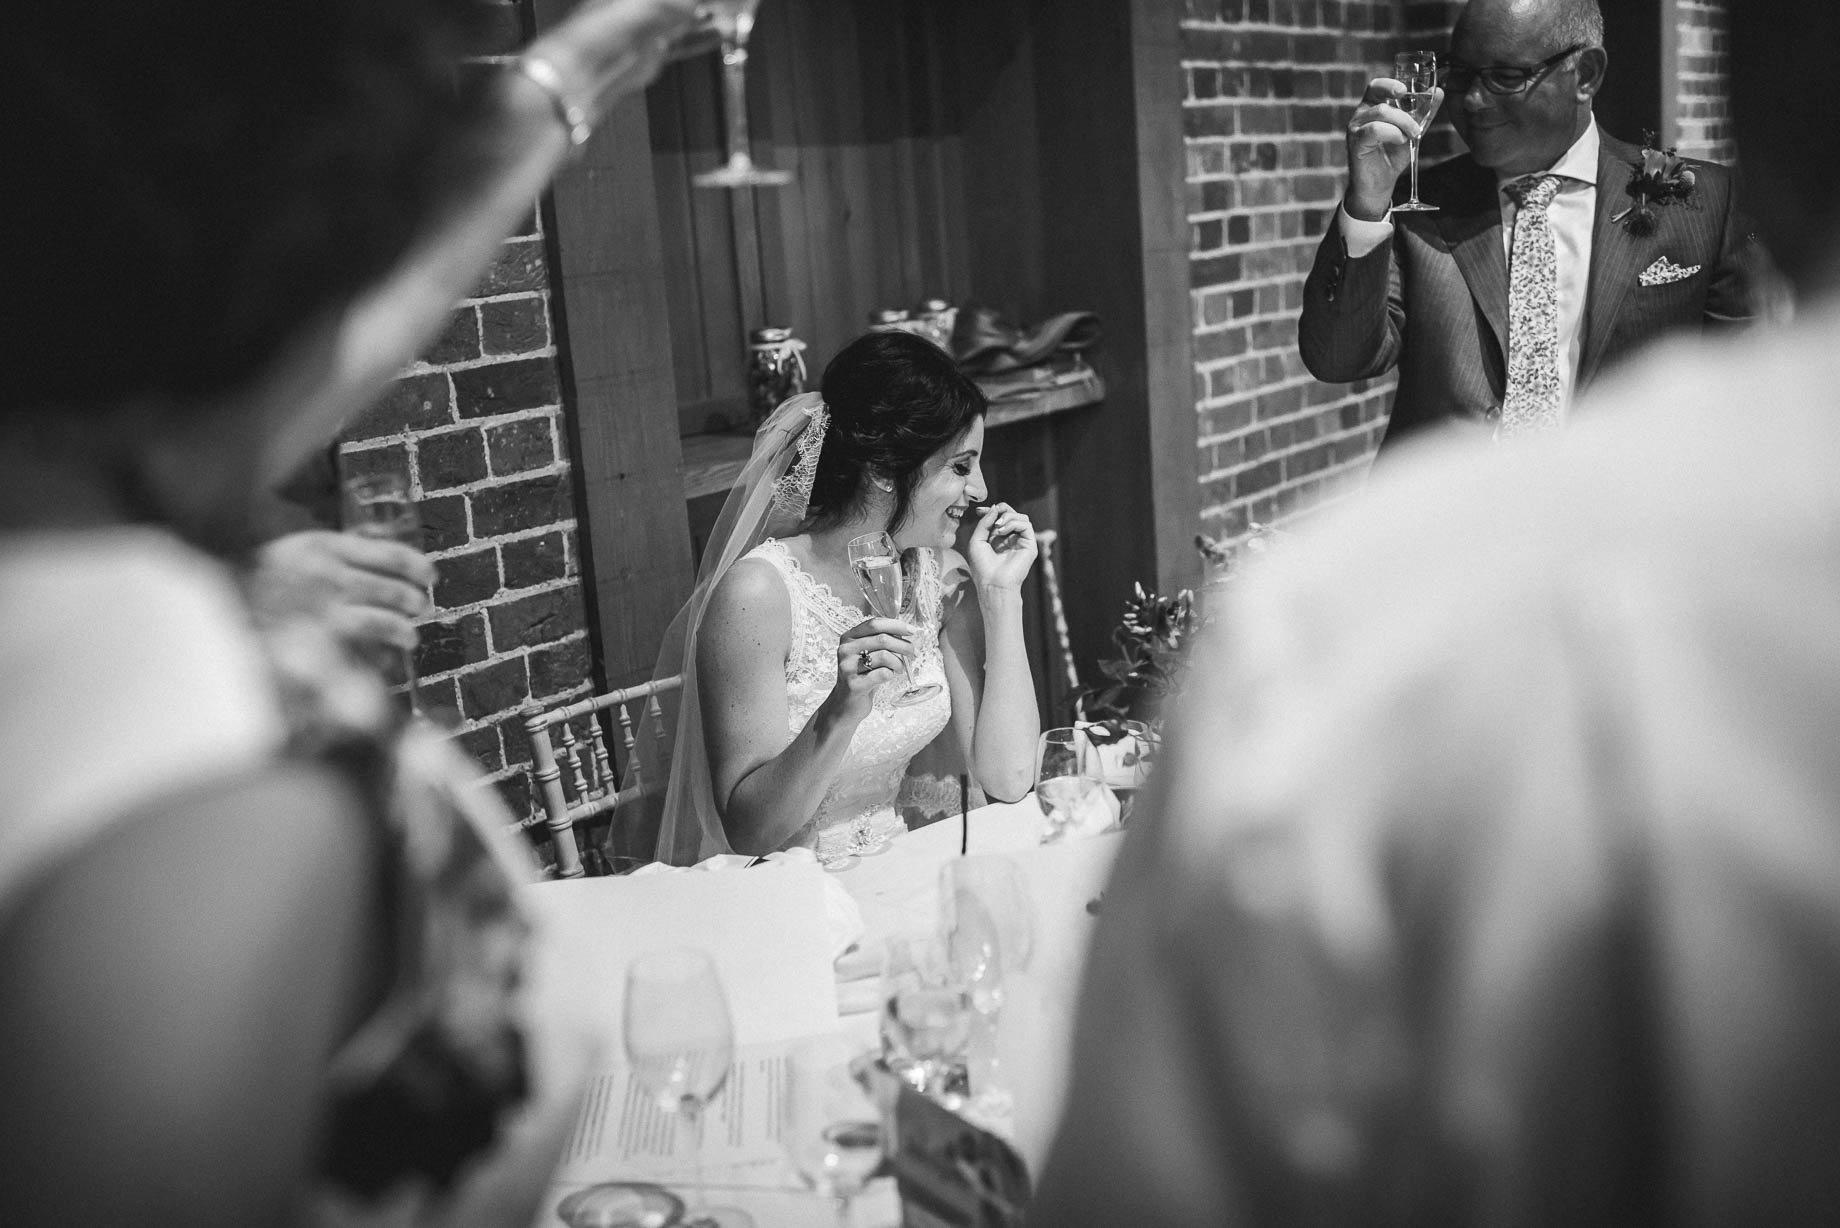 Gaynes Park wedding photography - Guy Collier Photography - Rachel and Jon (129 of 169)